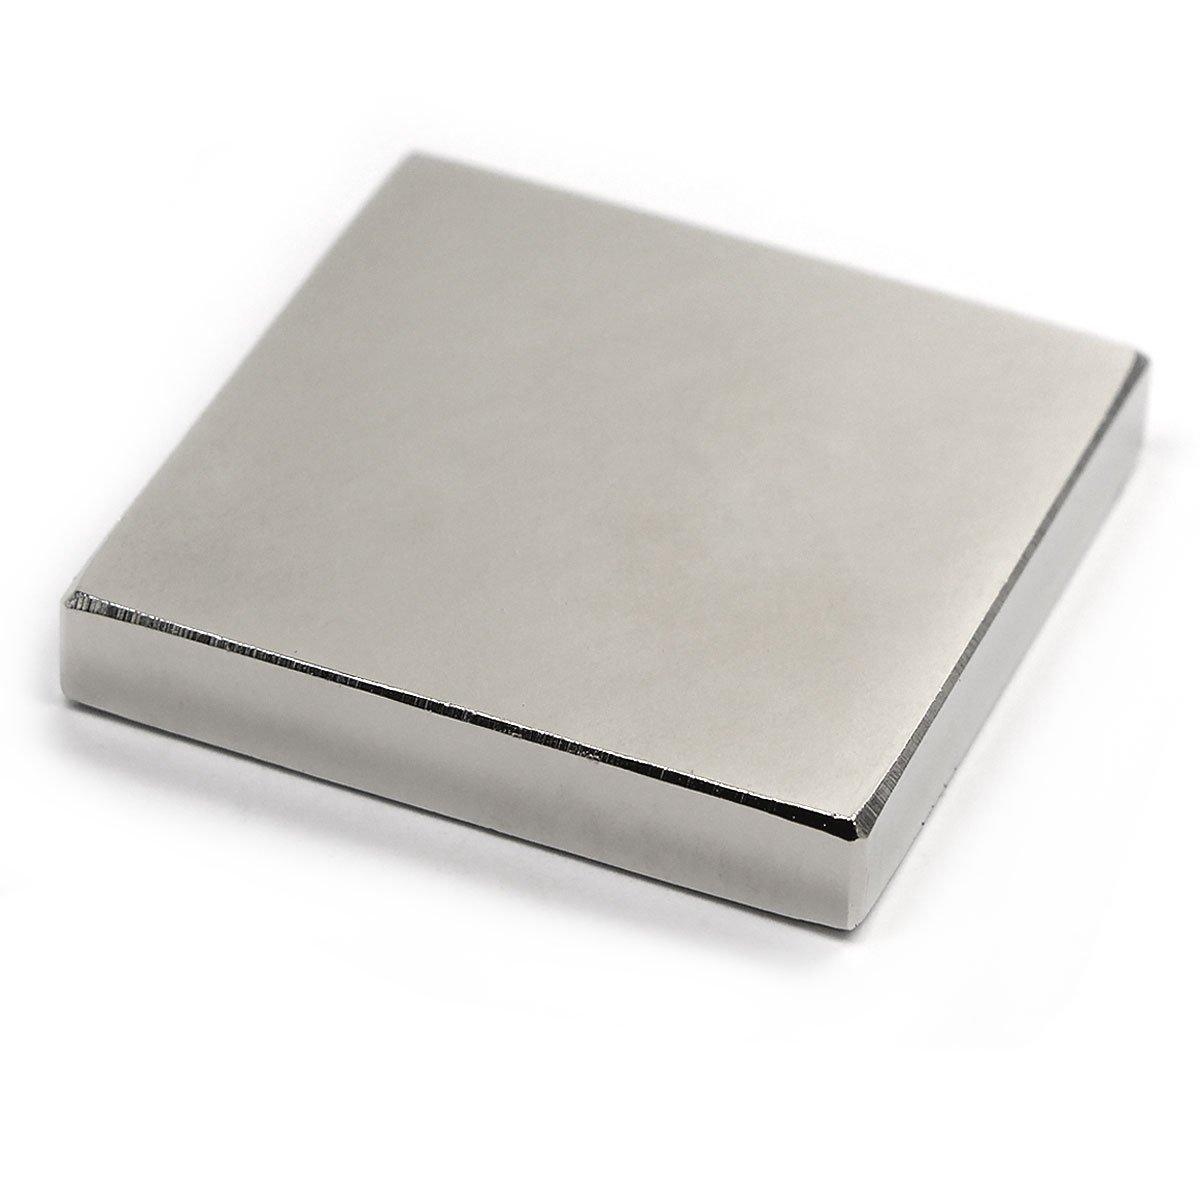 Grade Sale SALE% OFF N52 Rectangle Neodymium Discount mail order Magnet Squa 1.5 Flat 0.25